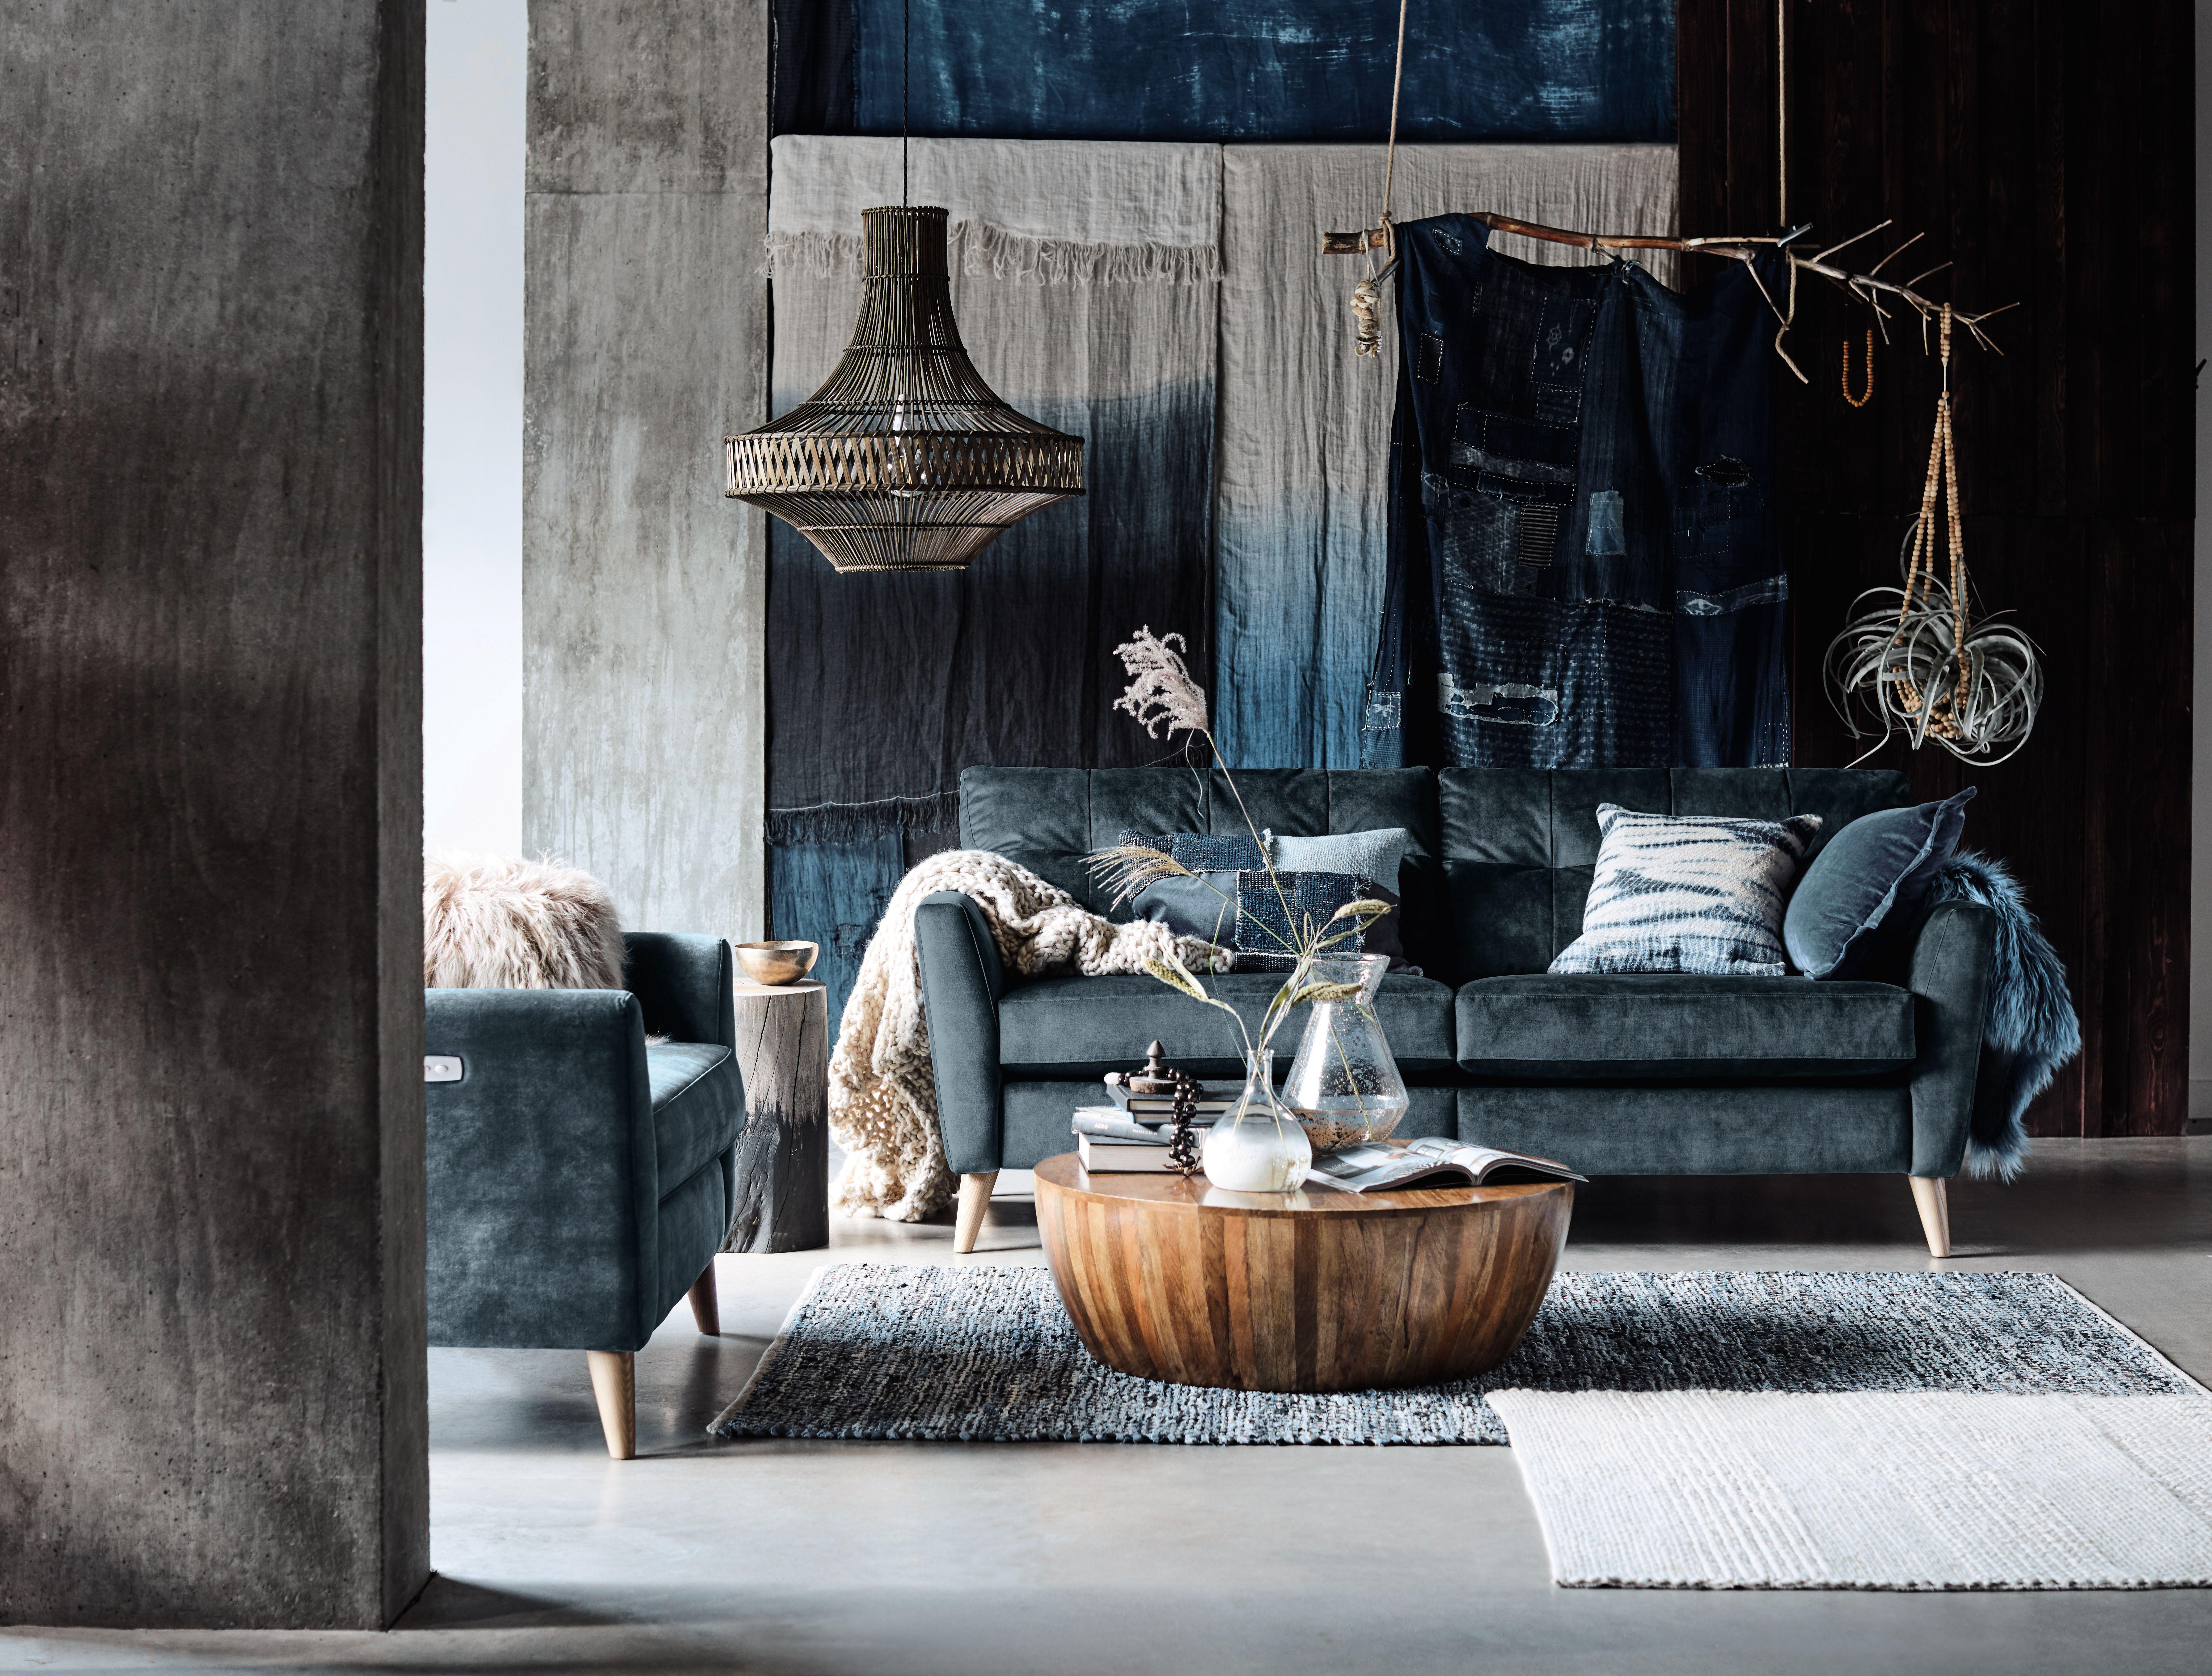 26 gorgeous grey living room ideas in 2020 | living room grey, interior design trends, room design